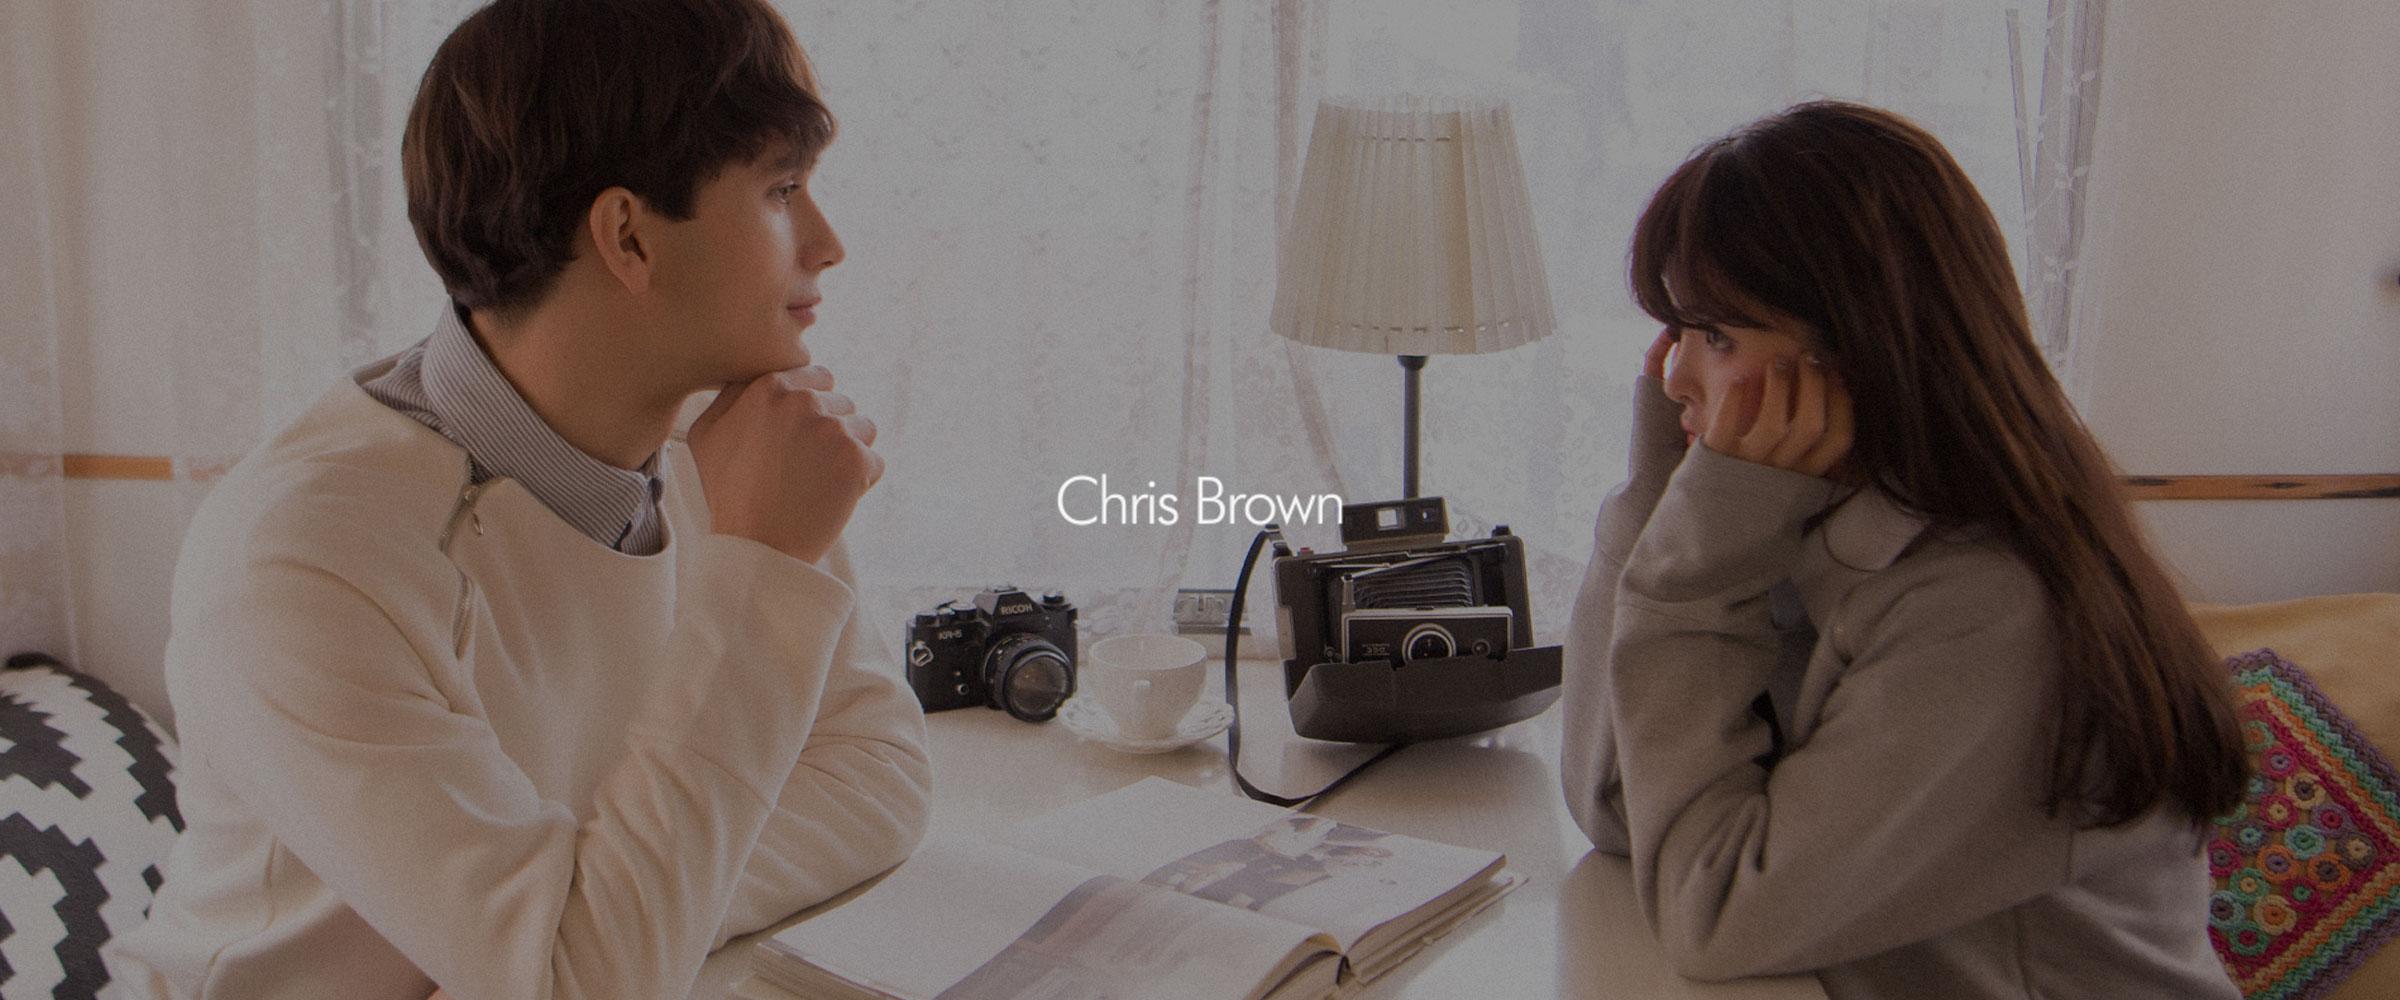 chrisbrown.jpg